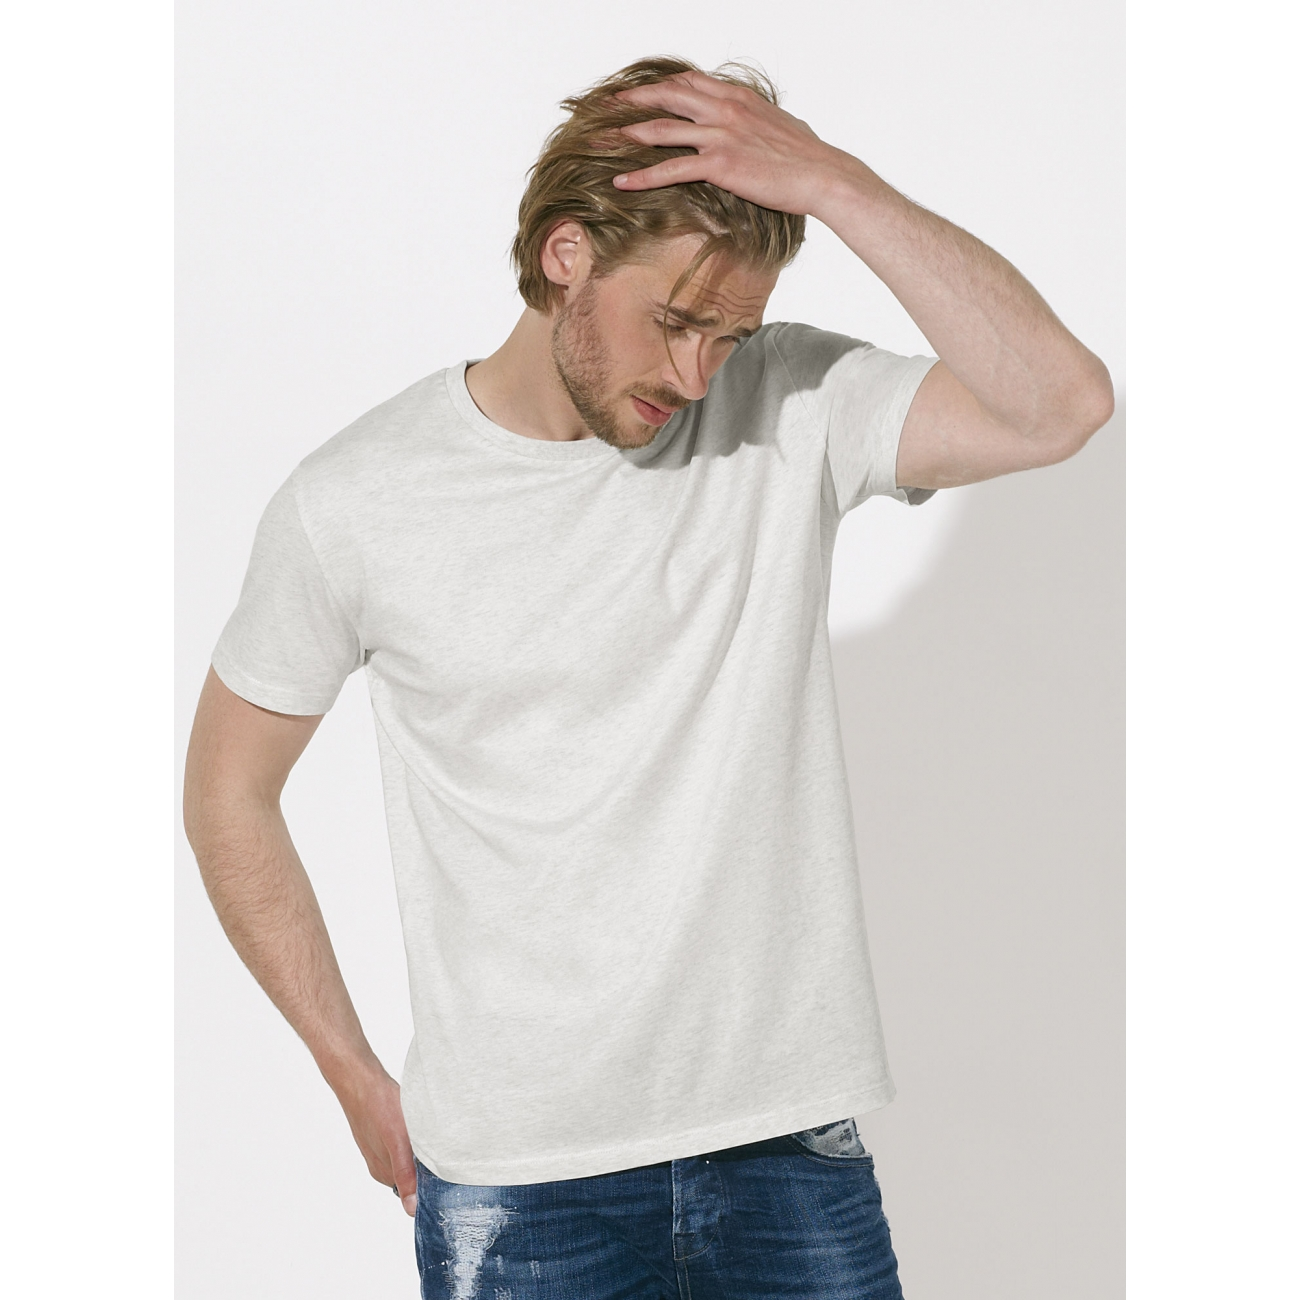 https://tee-shirt-bio.com/3538-thickbox_default/tee-shirt-coton-bio-col-blanc-creme-chine.jpg